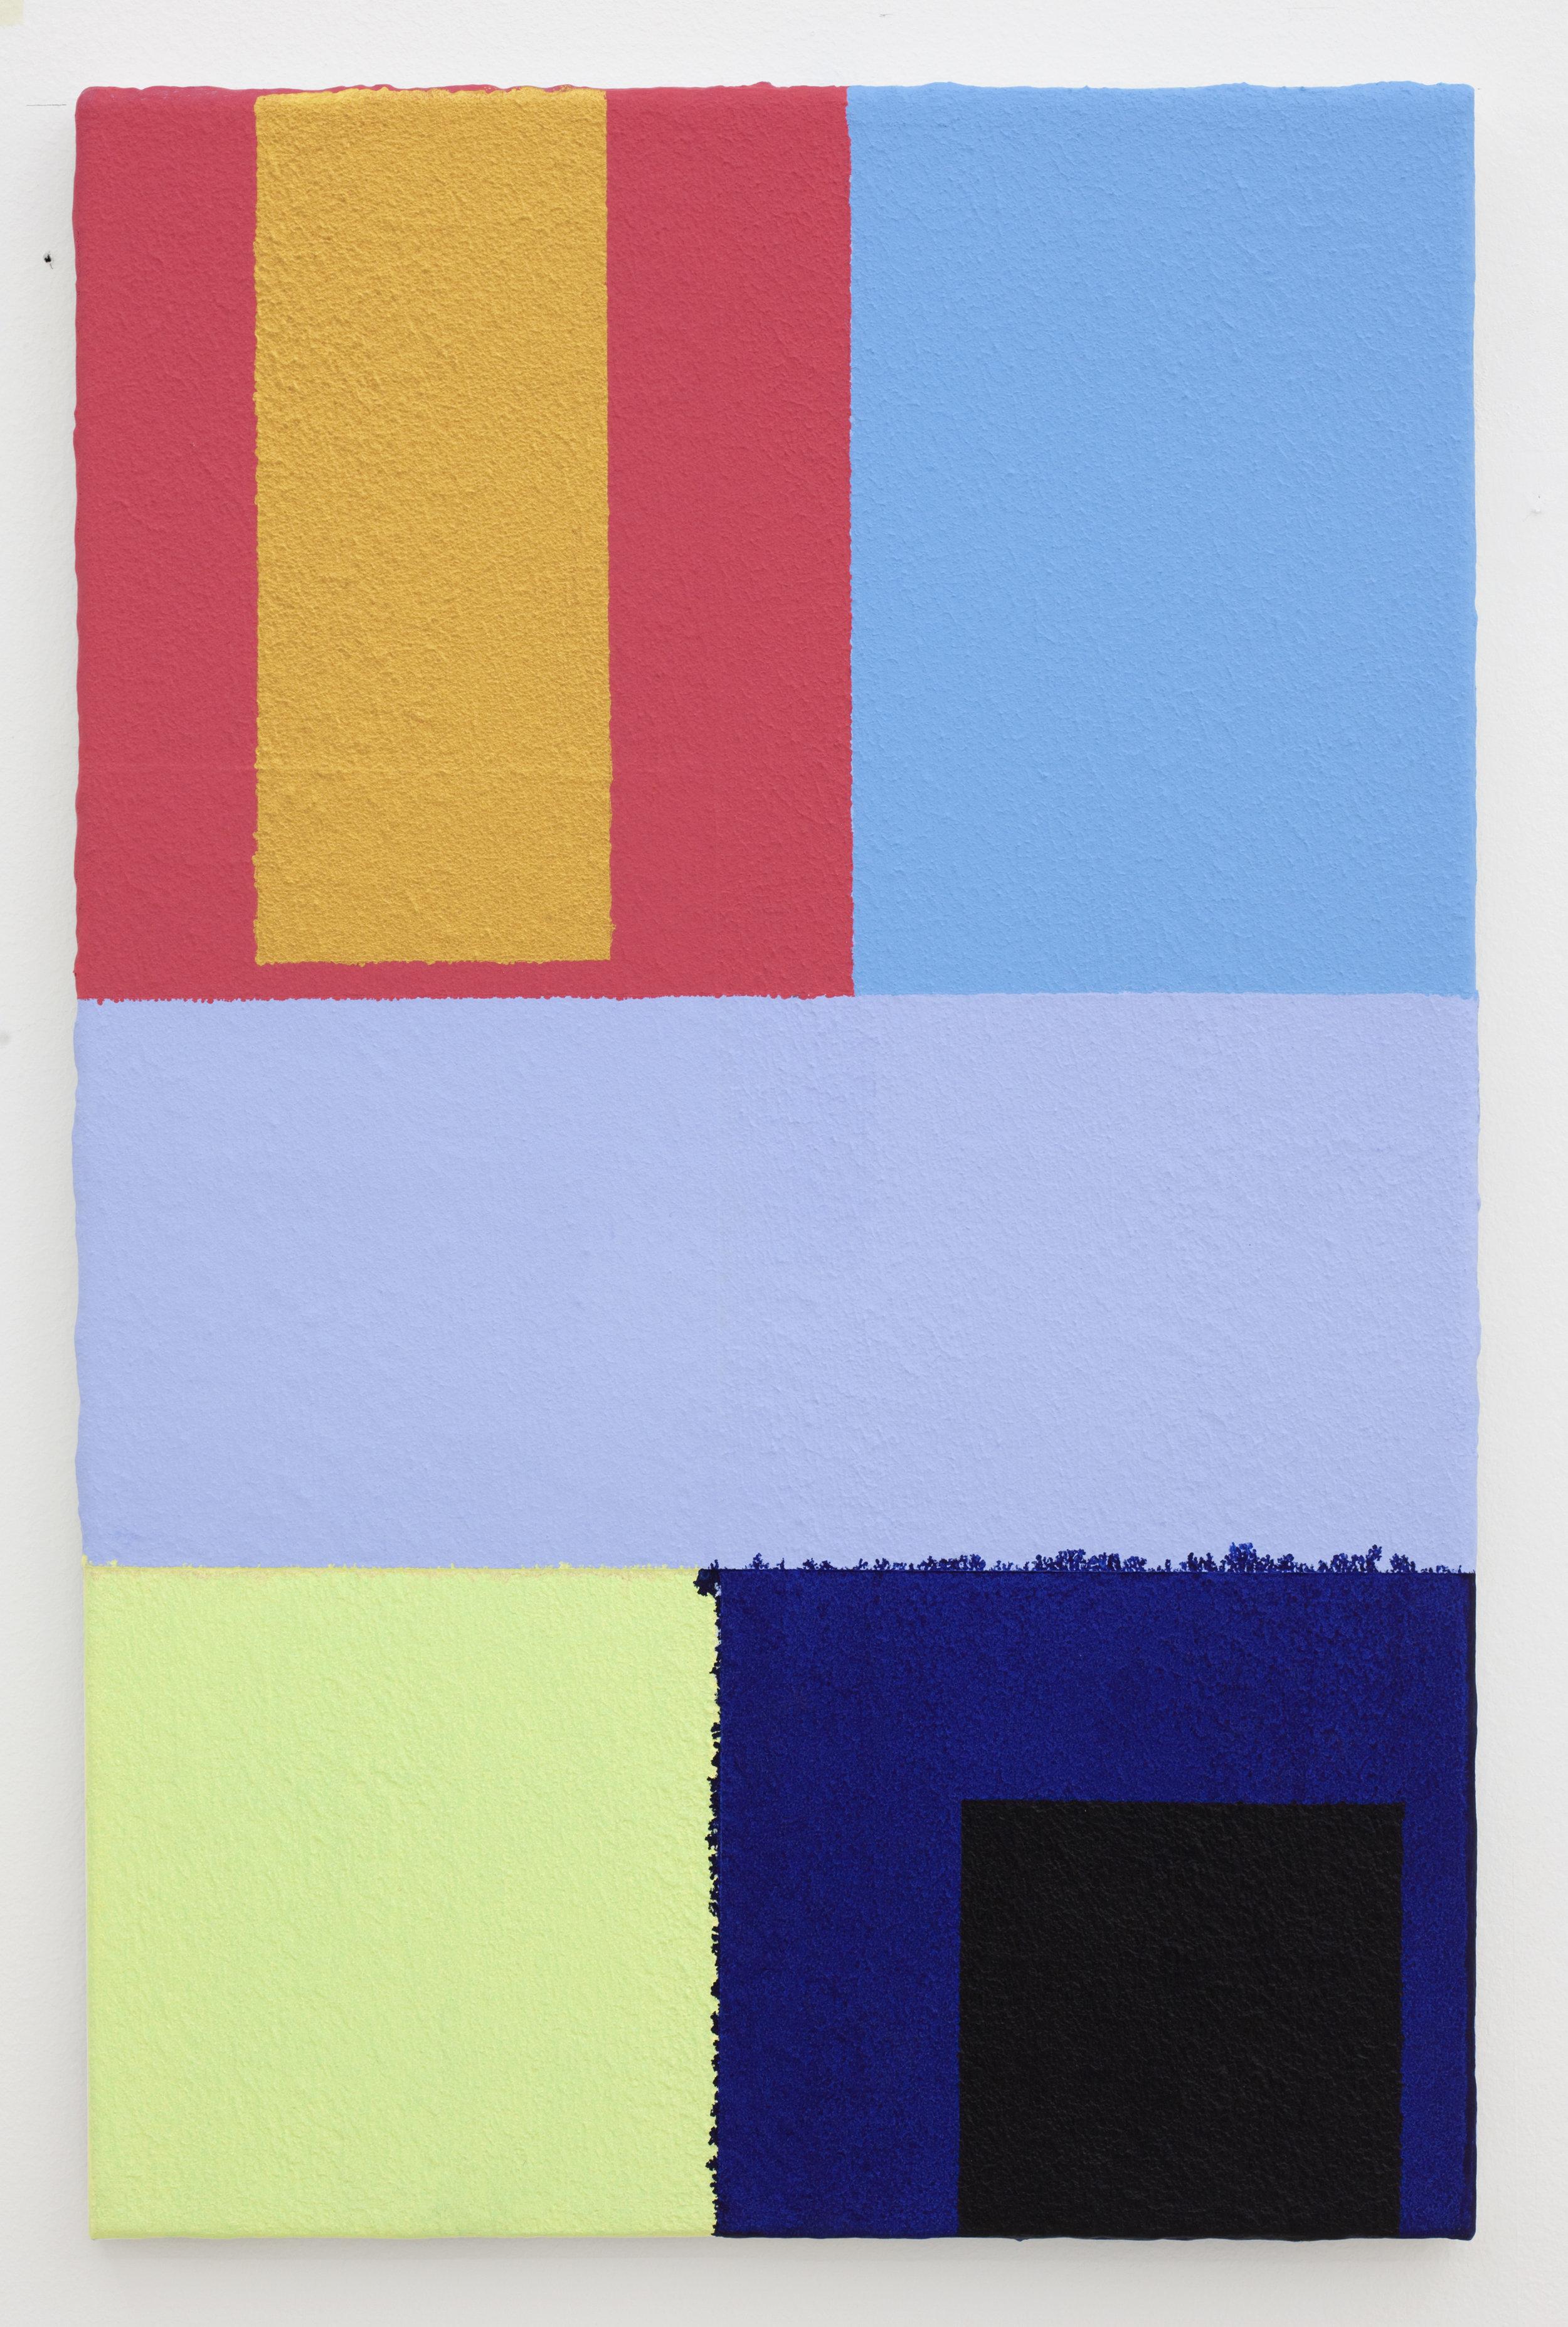 - 38. Bodil Nielsen. Untitled. 2012. Acrylic on canvas. 60 x 45 cm.